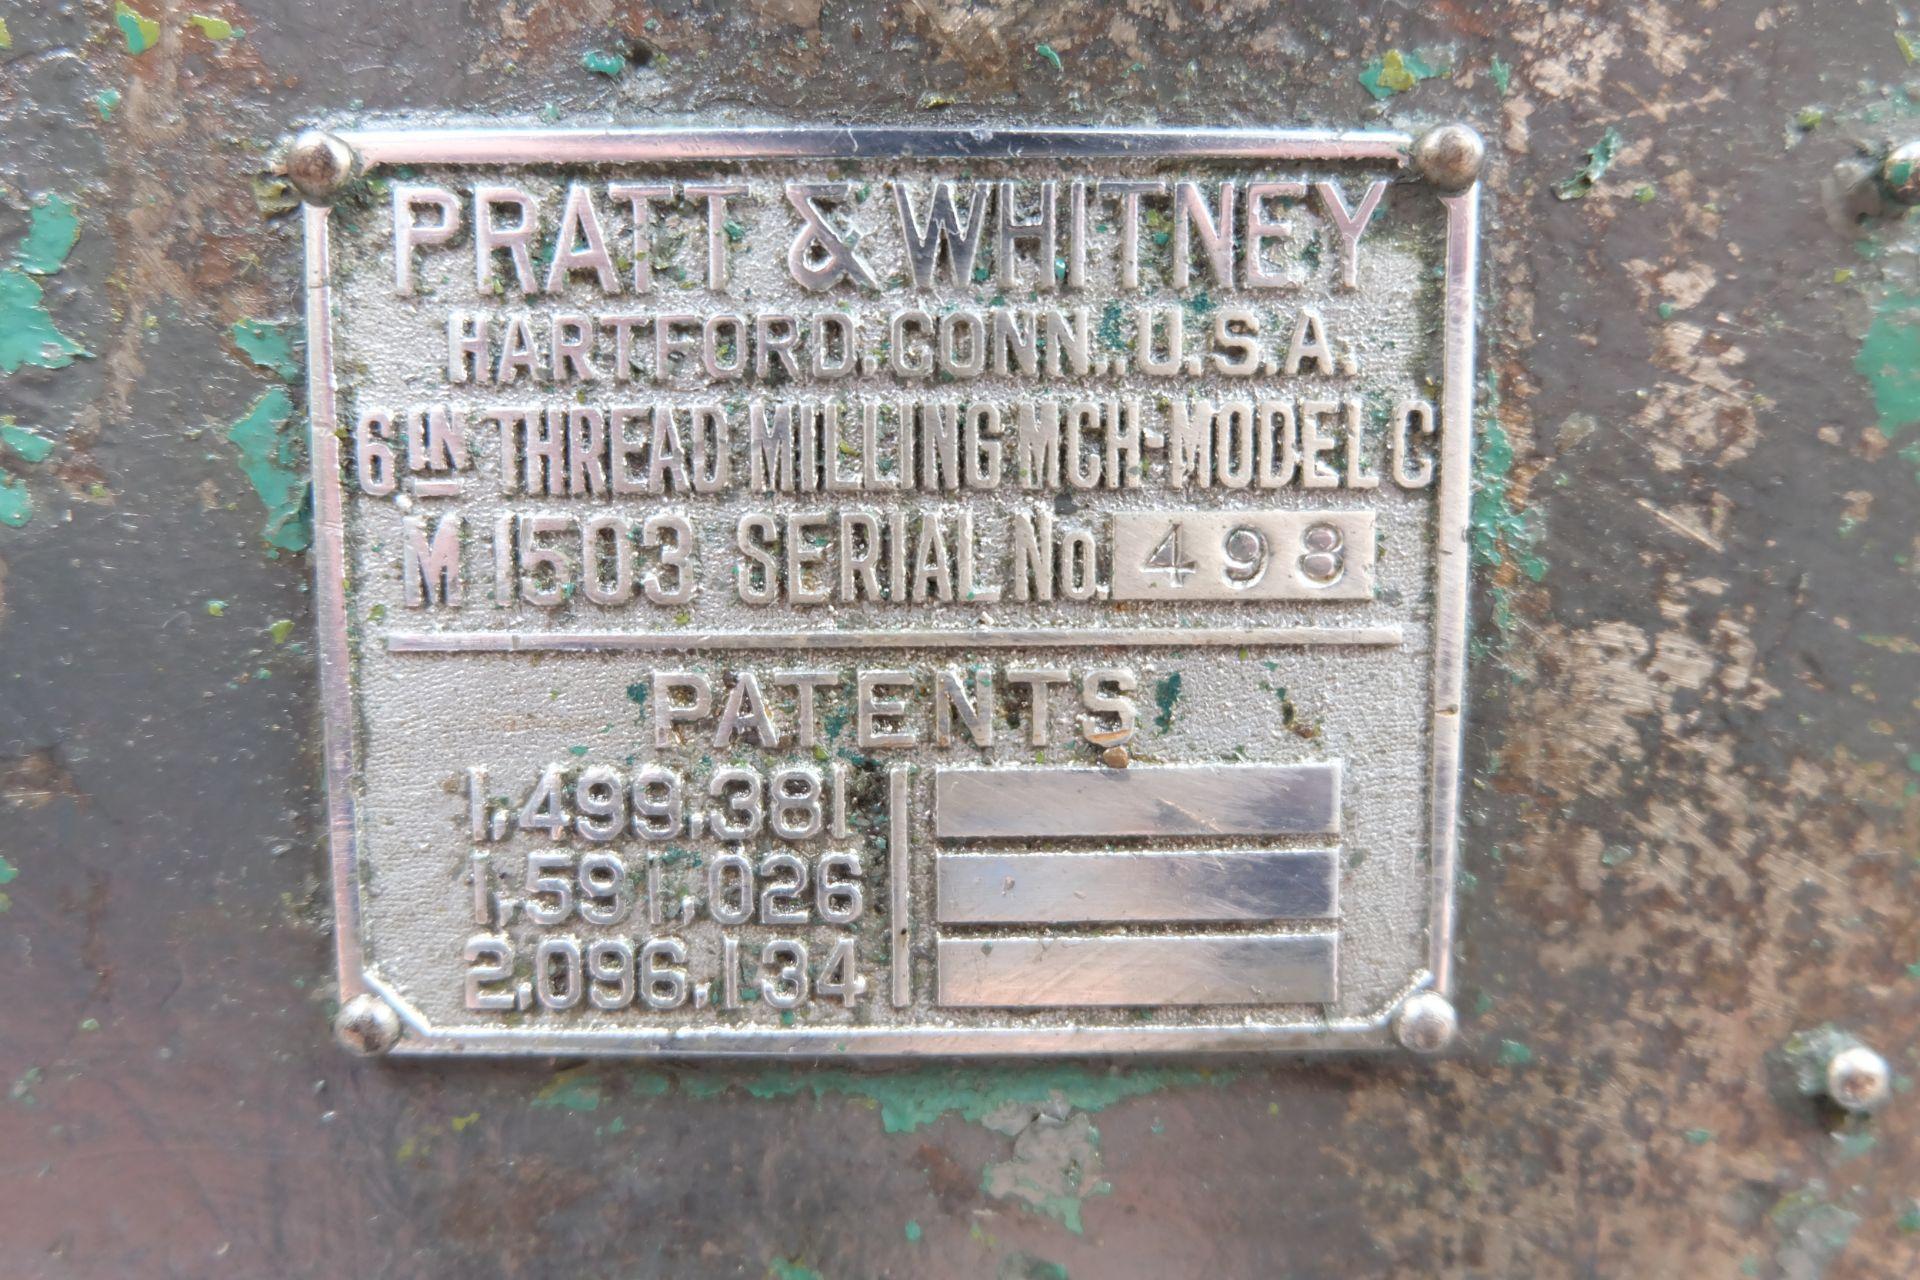 "Pratt & Whitney Model C-M1503 6"" Thread Milling Machine. - Image 8 of 13"